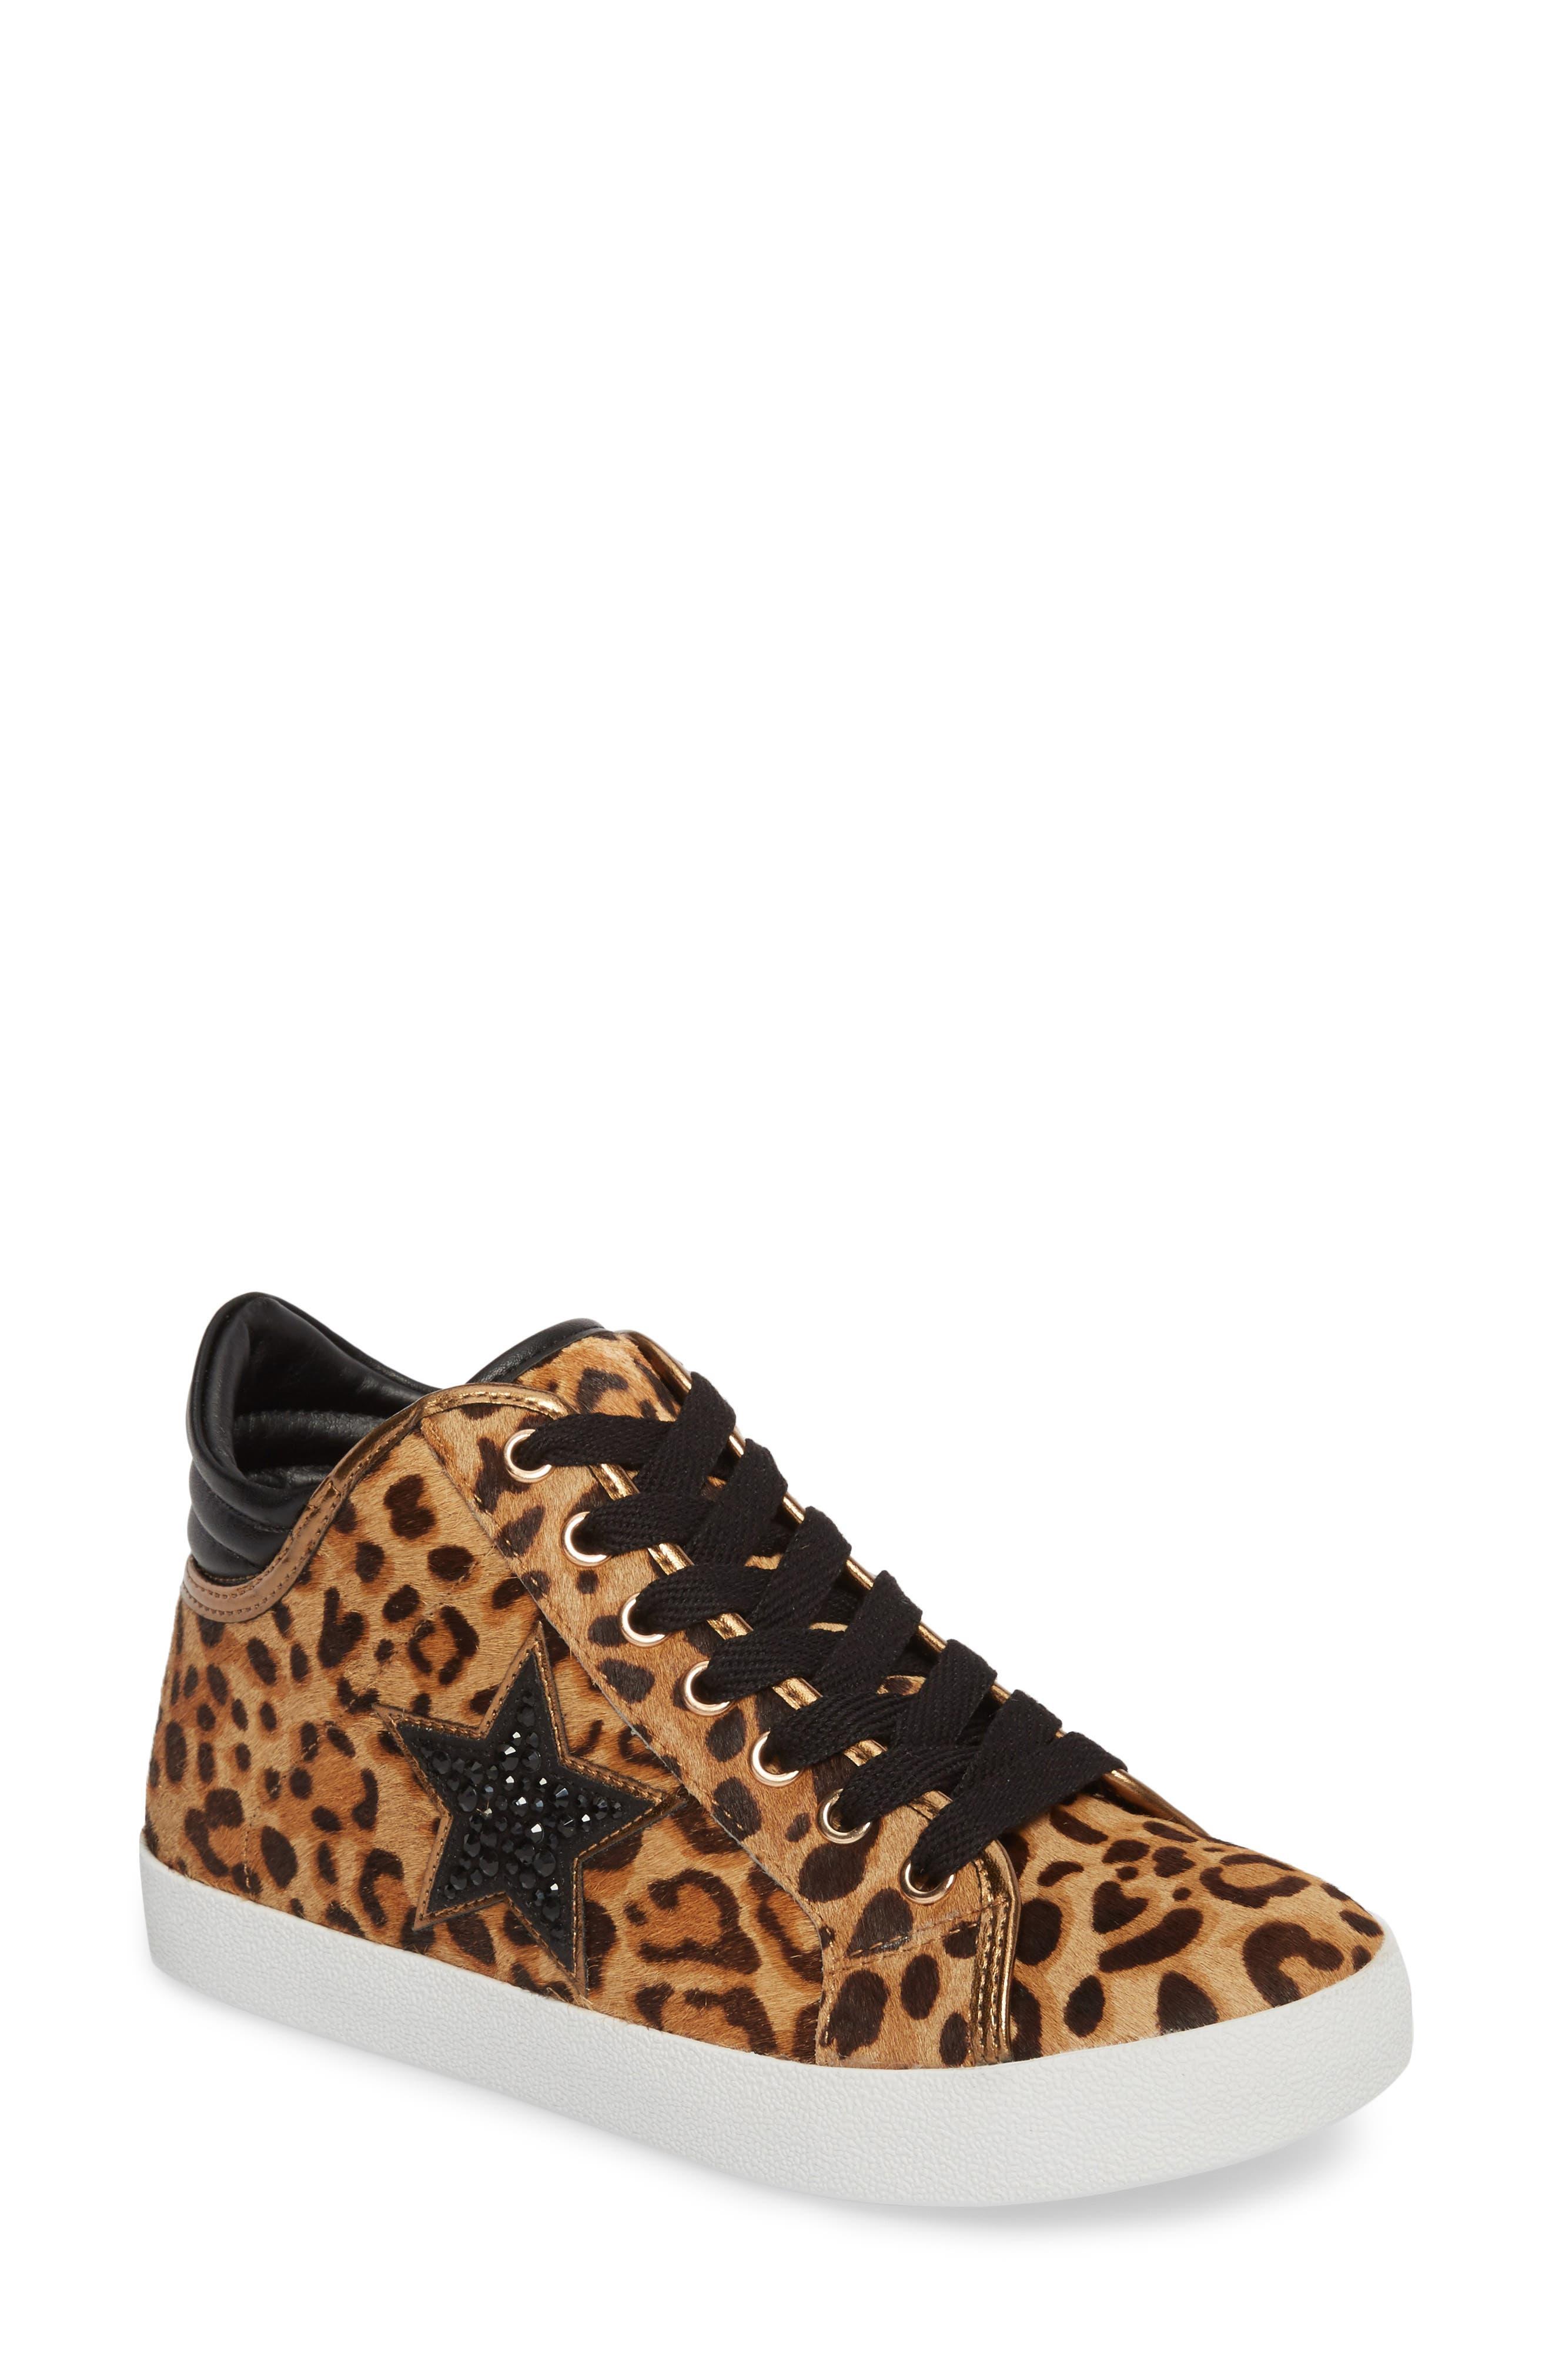 Savior Star Sneaker,                         Main,                         color, Leopard Multi